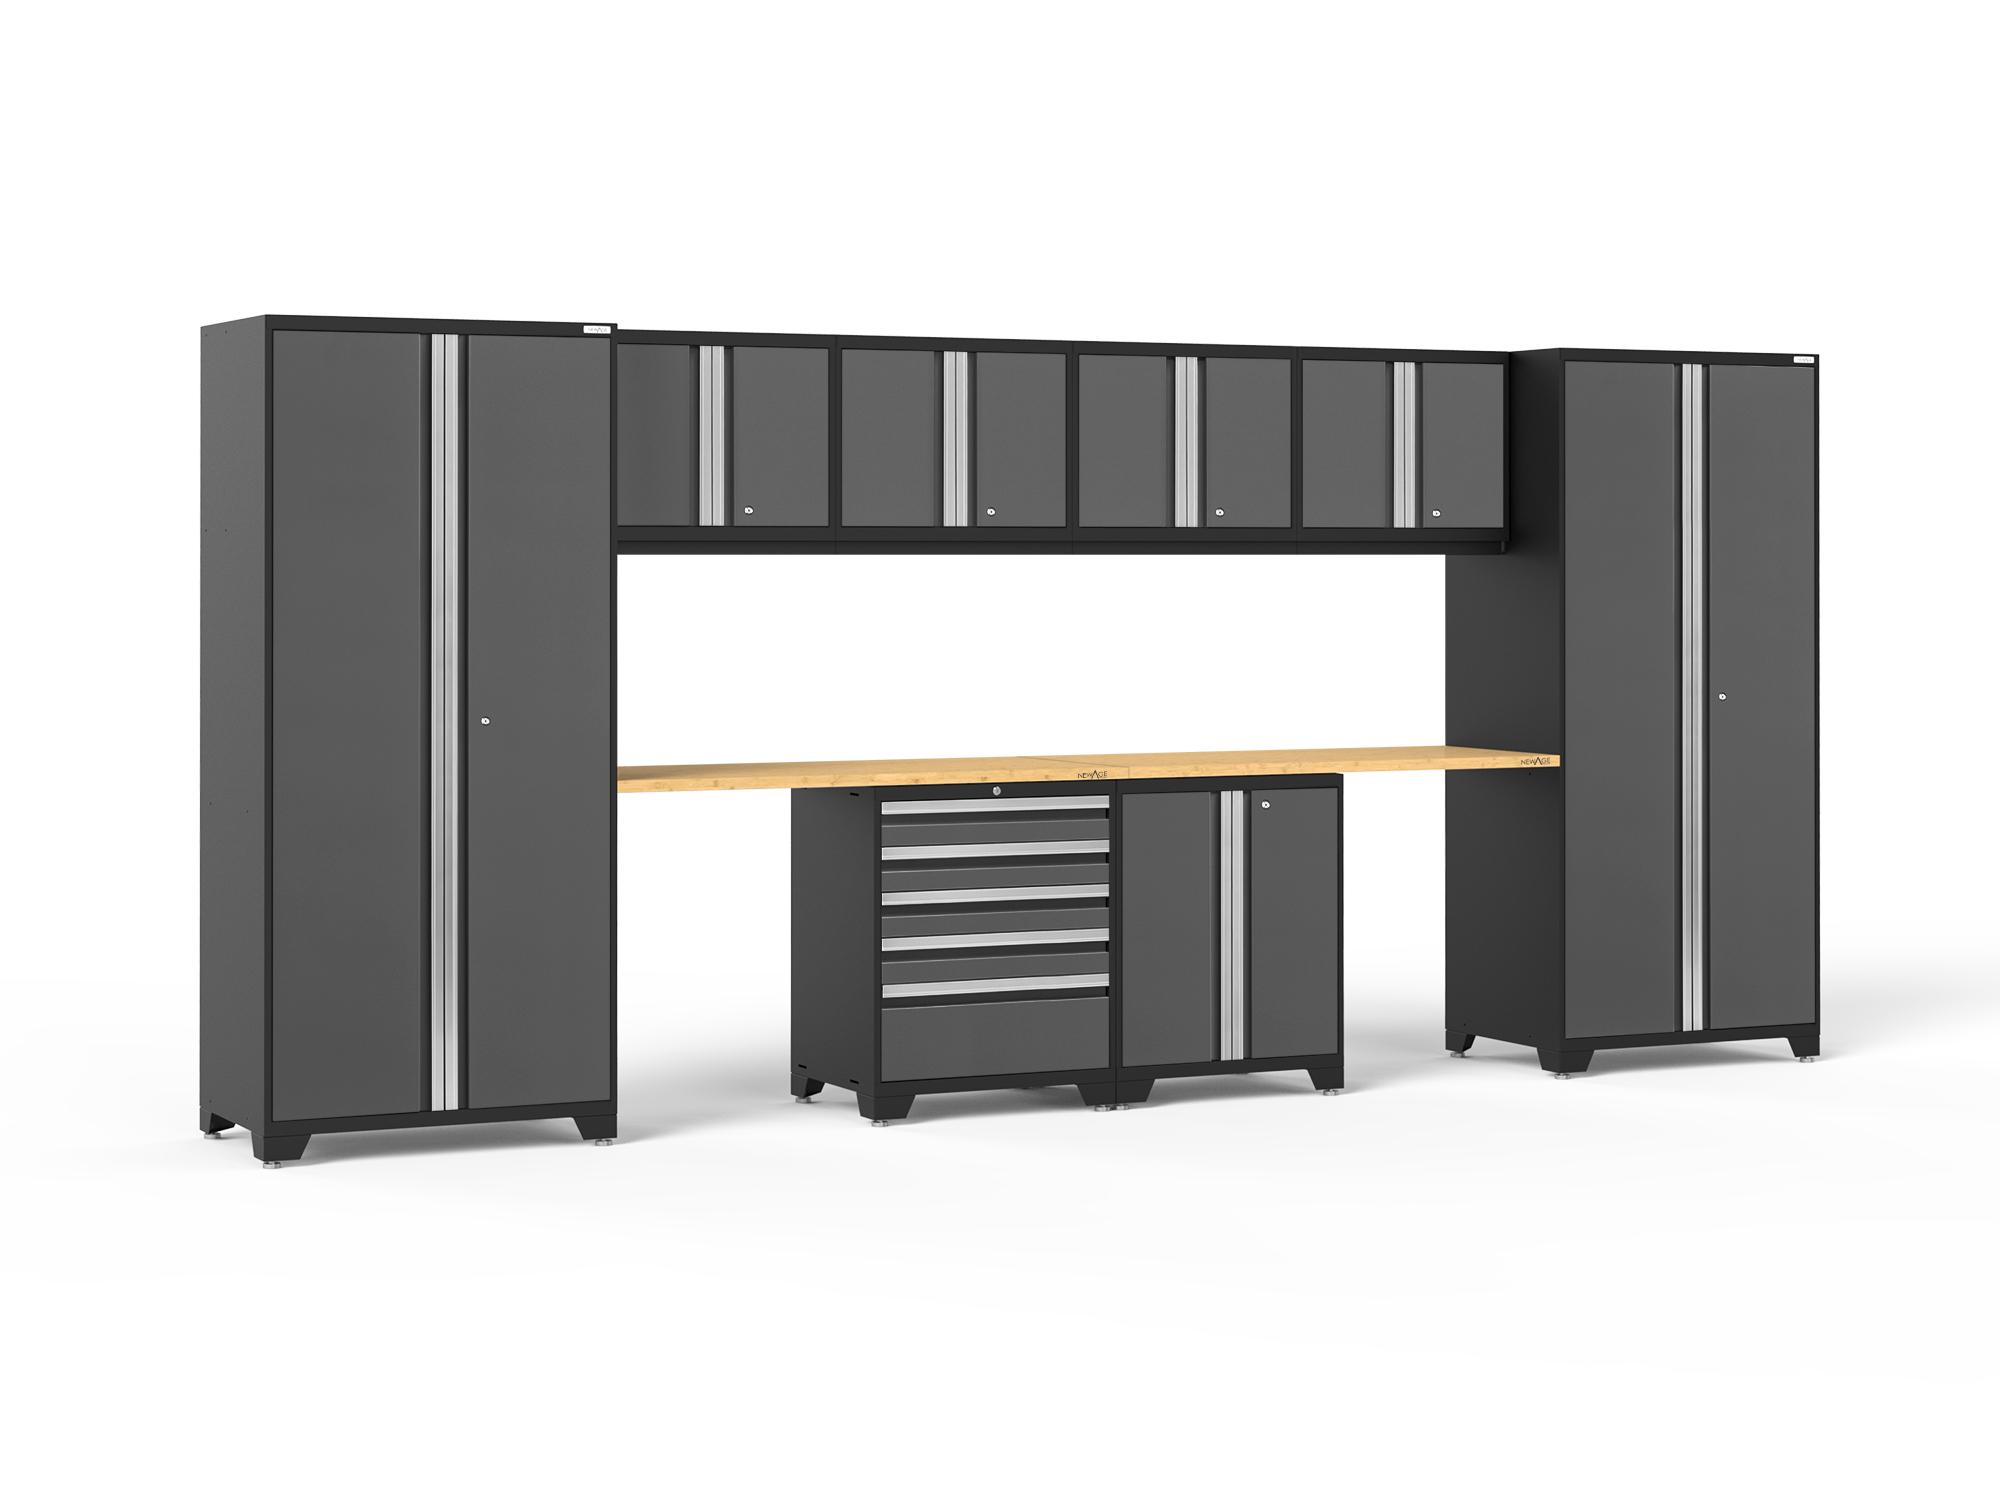 Newage Products Pro 3 0 Series Platinum 10 Piece Cabinet Set Walmart Com Walmart Com